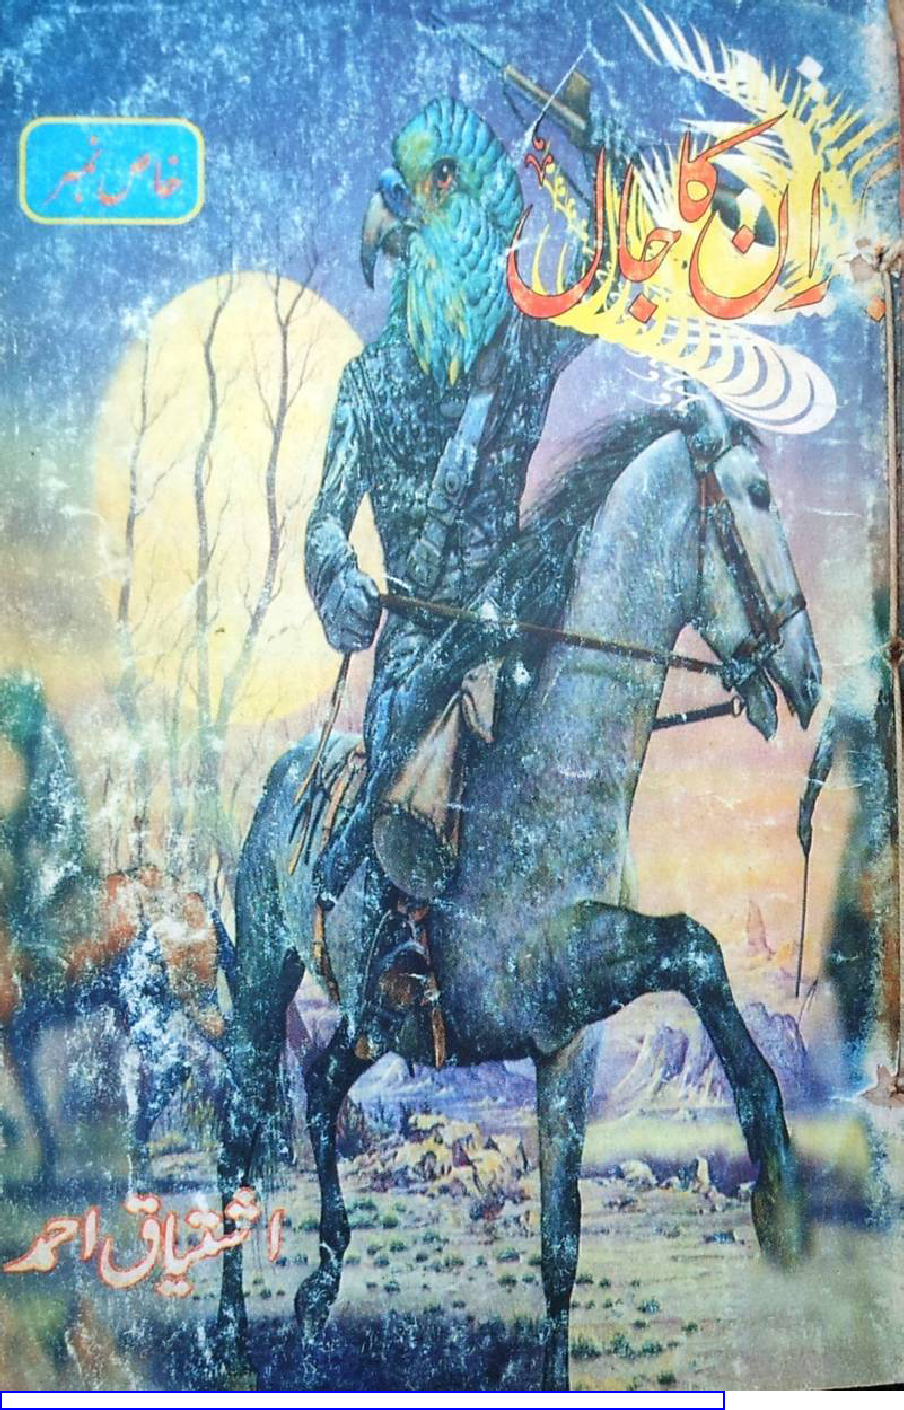 Bigran Ka Jaal Khas Number Part 1 by Ishtiaq Ahmed